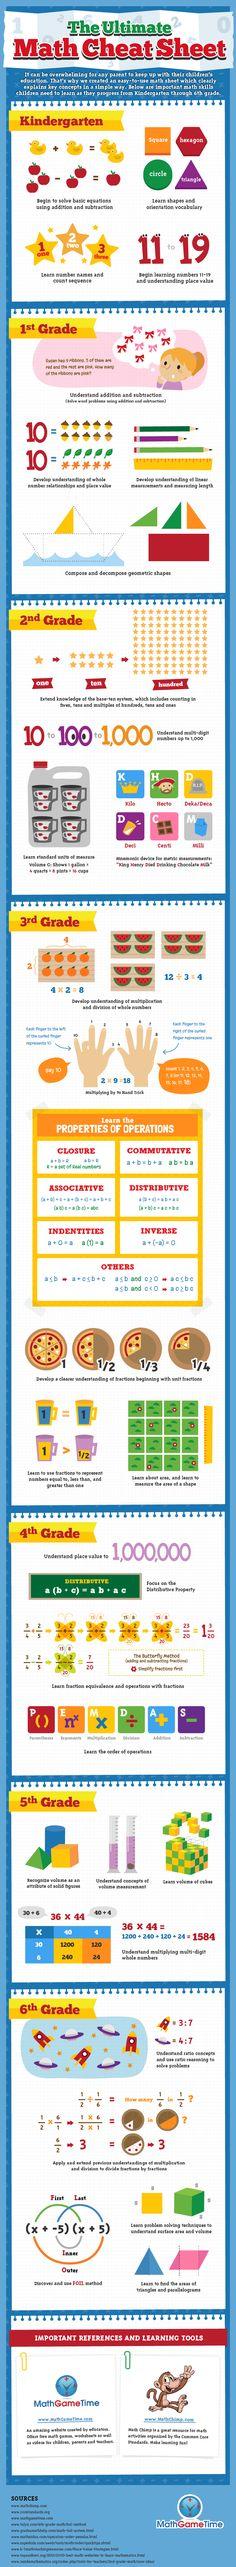 Math is Fun infographic